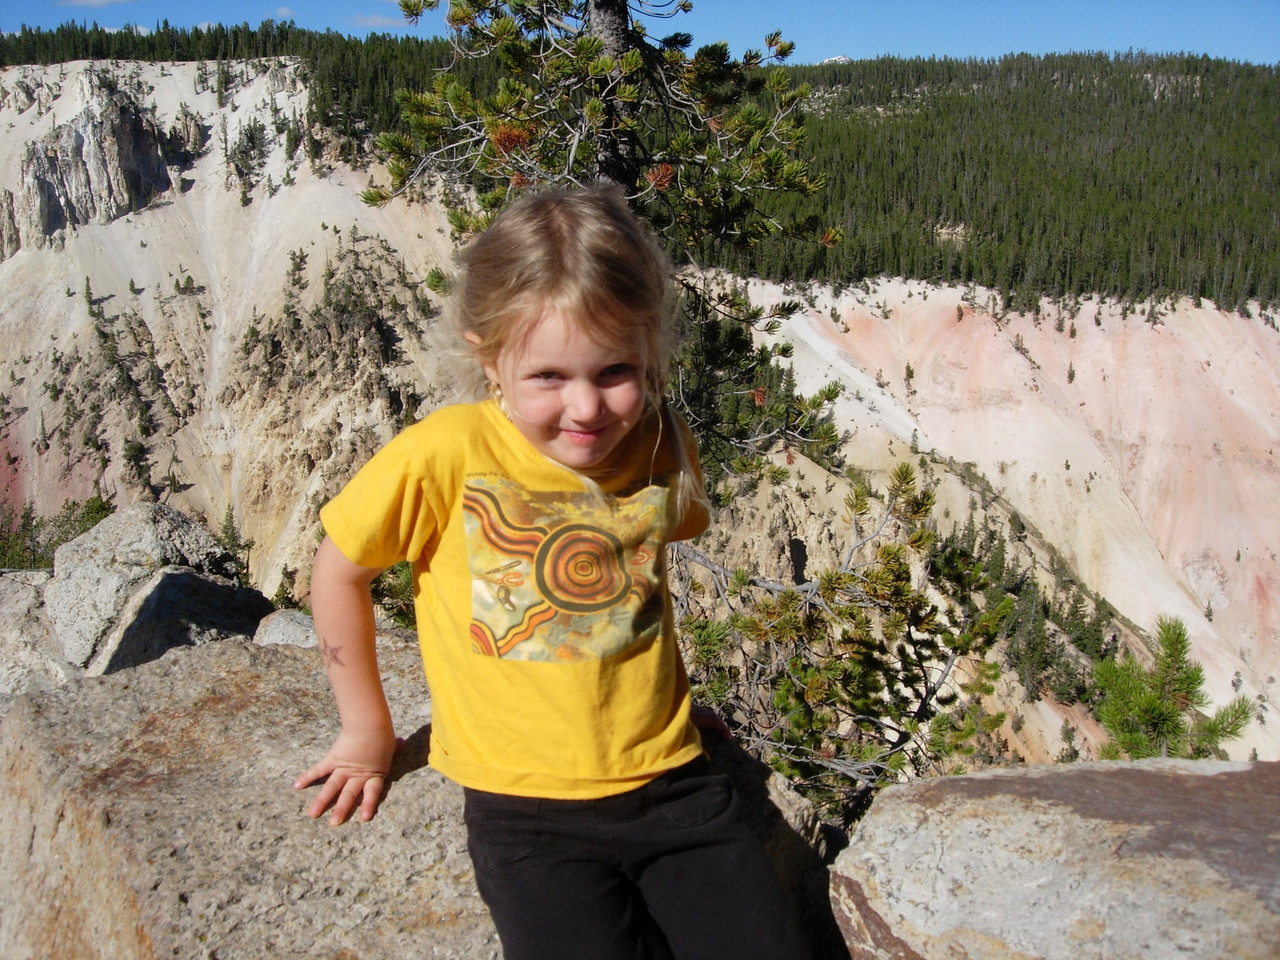 Kelly at the Grand Canyon of YellowstoneYellowstone National Park